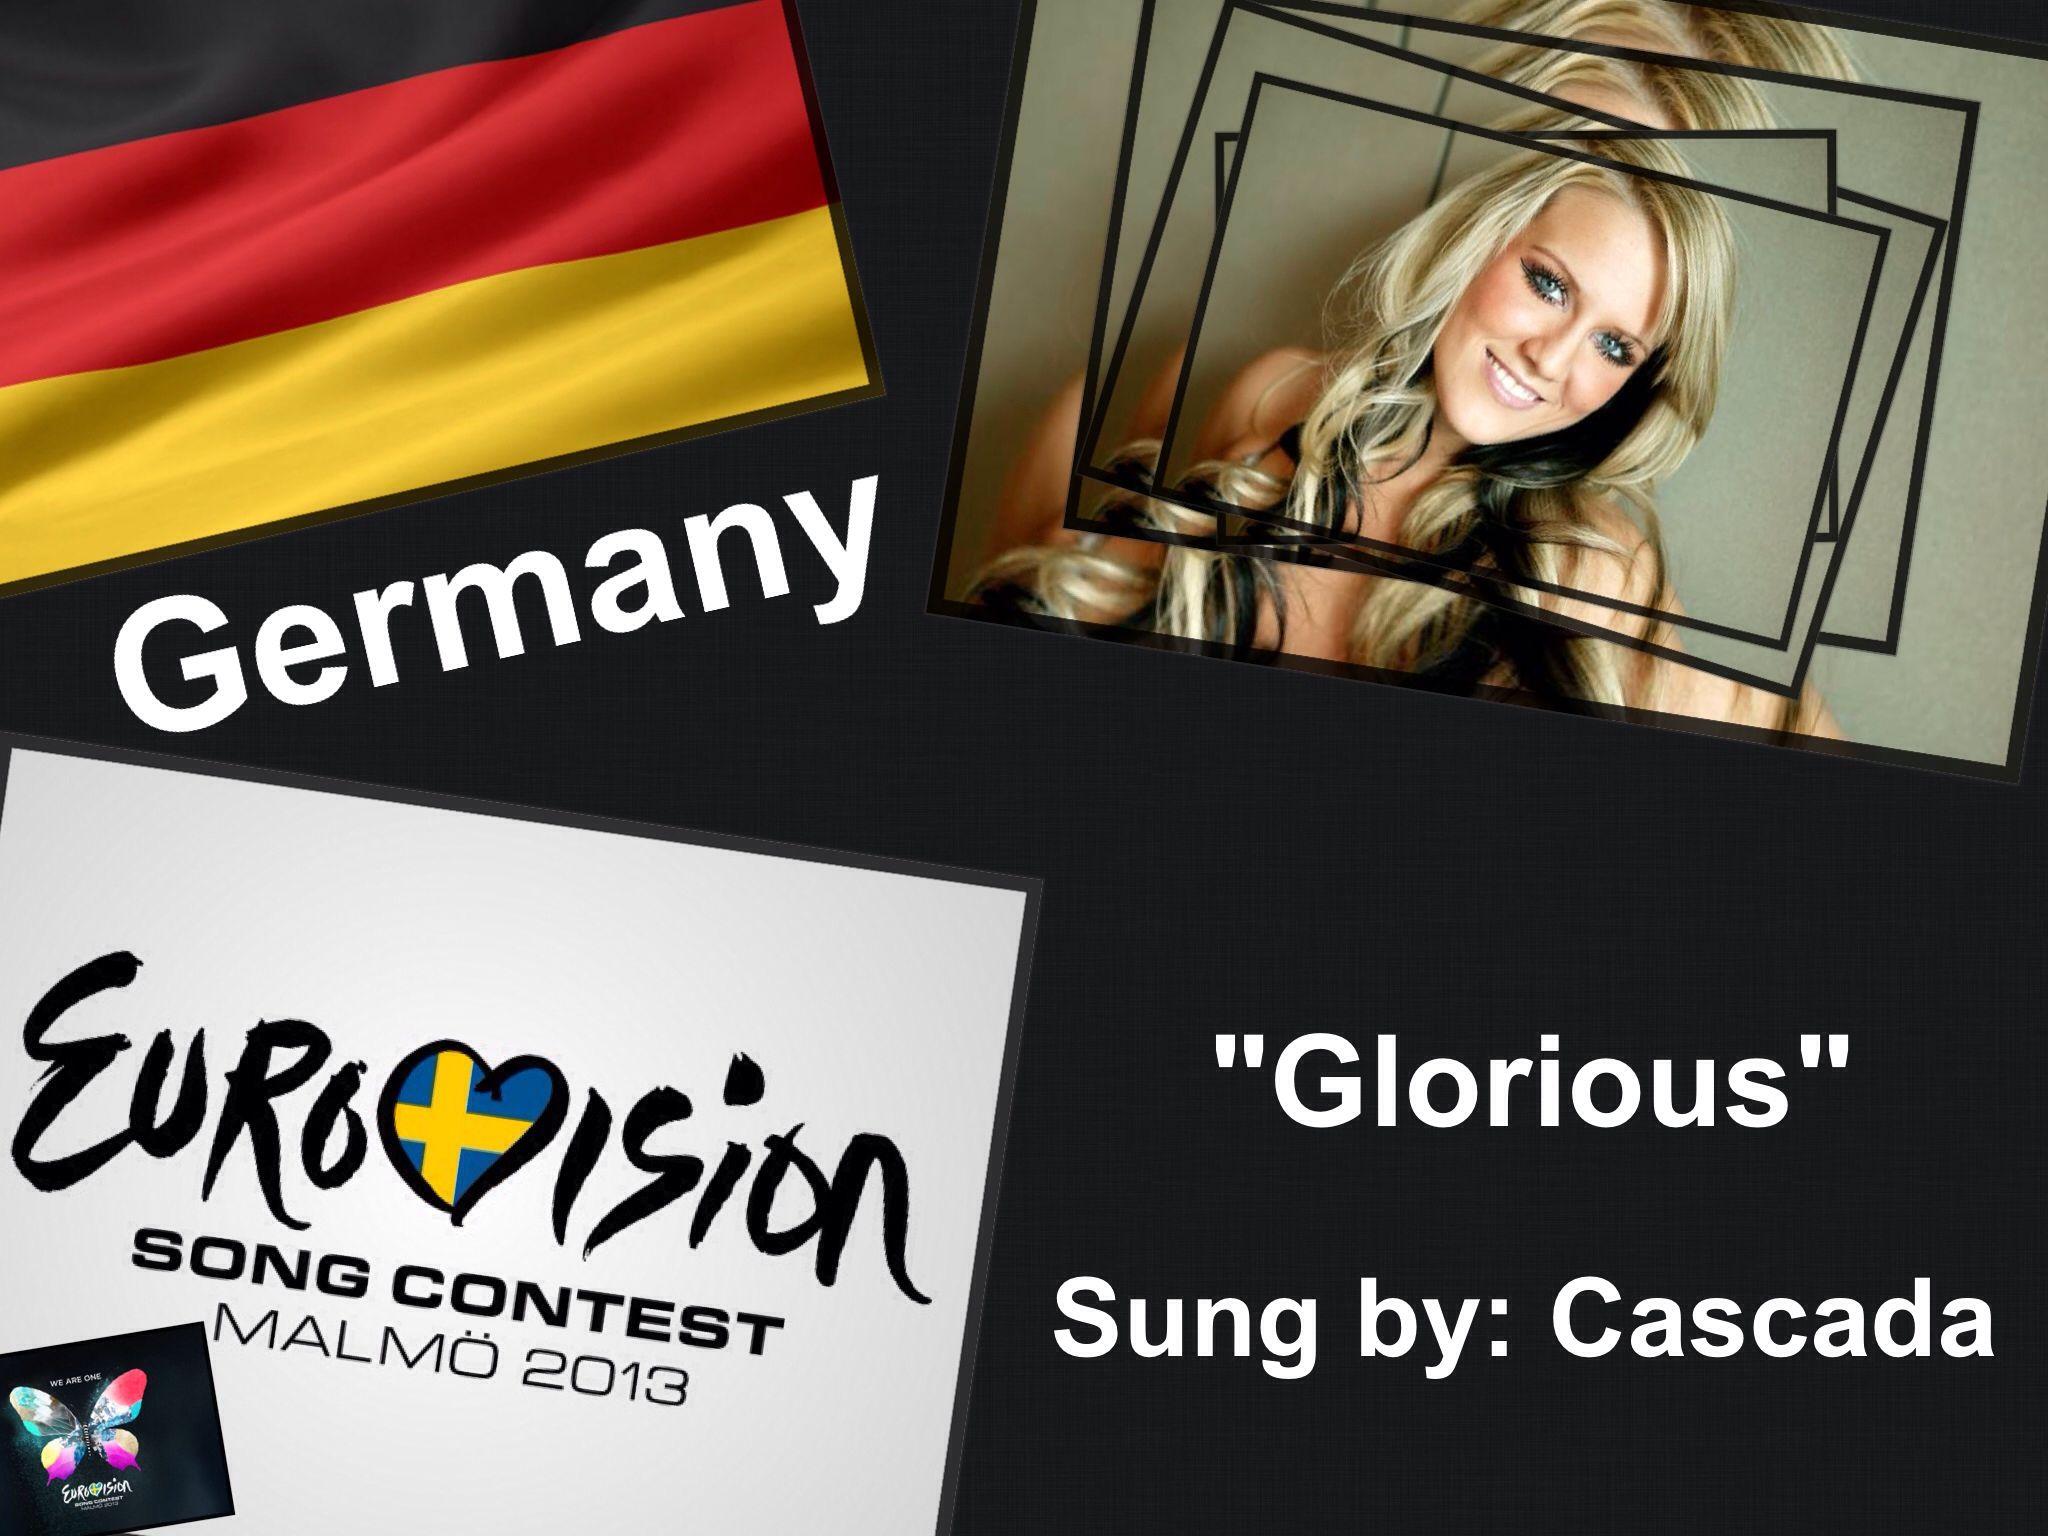 france 3 eurovision 2013 classement